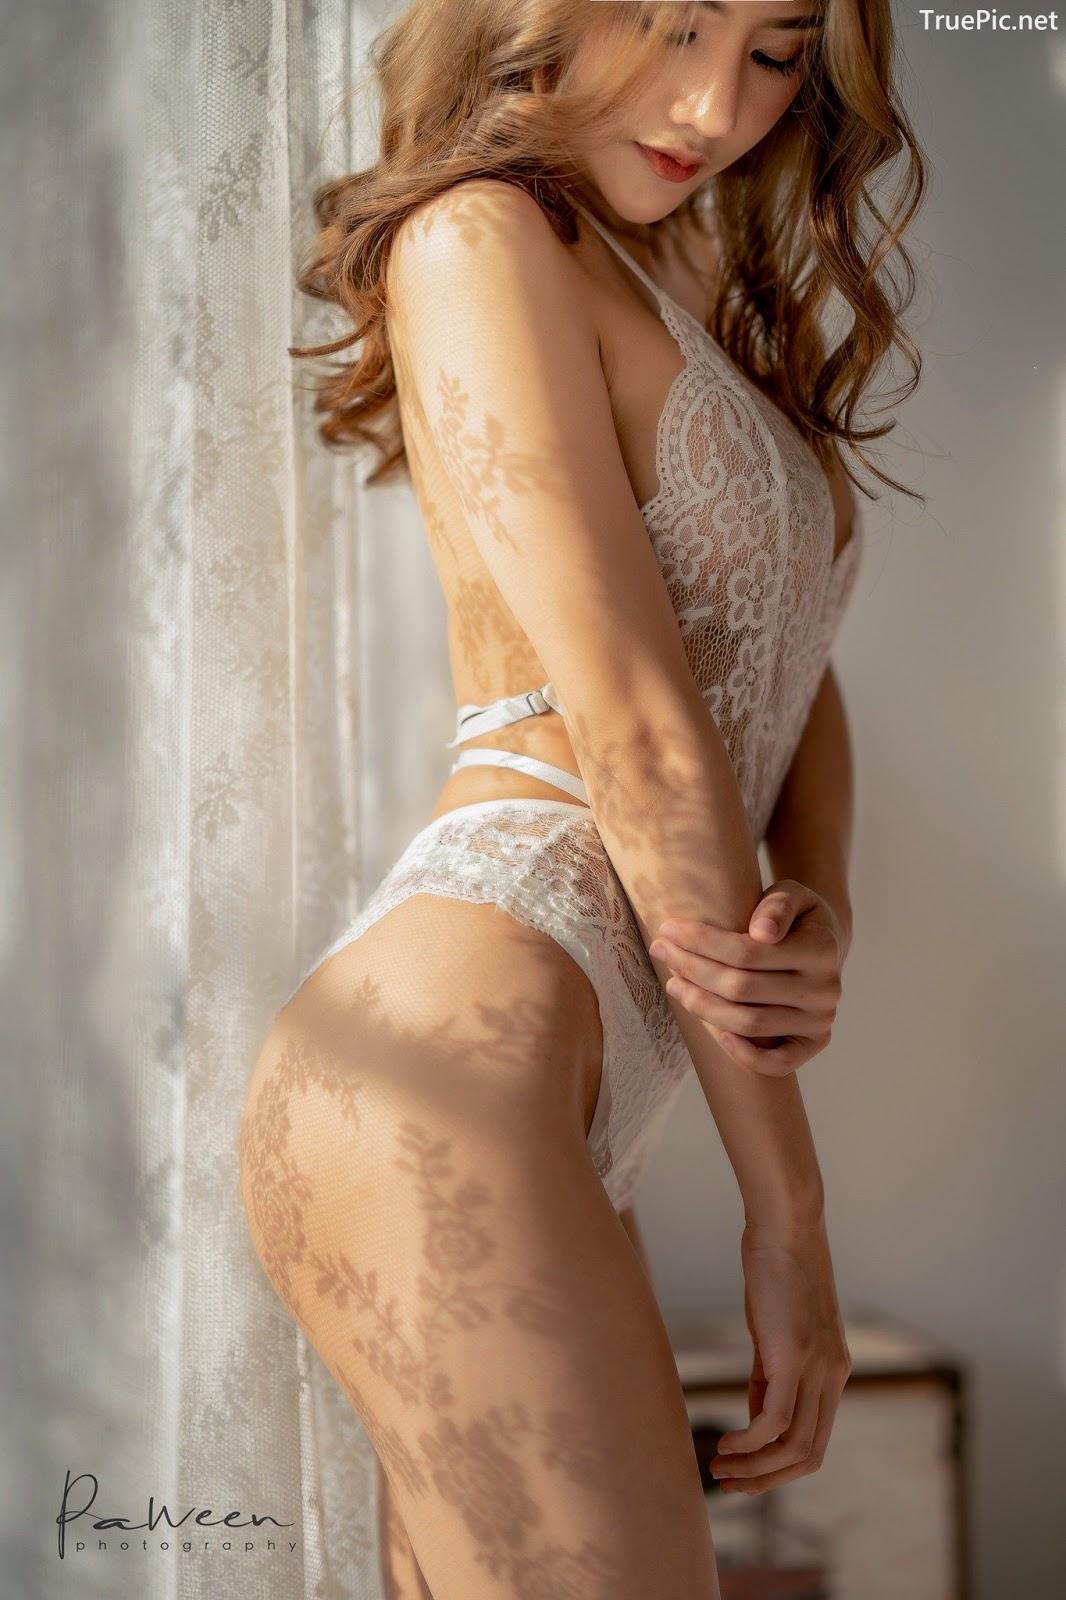 Image Thailand Model - Atittaya Chaiyasing - White Lace Lingerie - TruePic.net - Picture-13